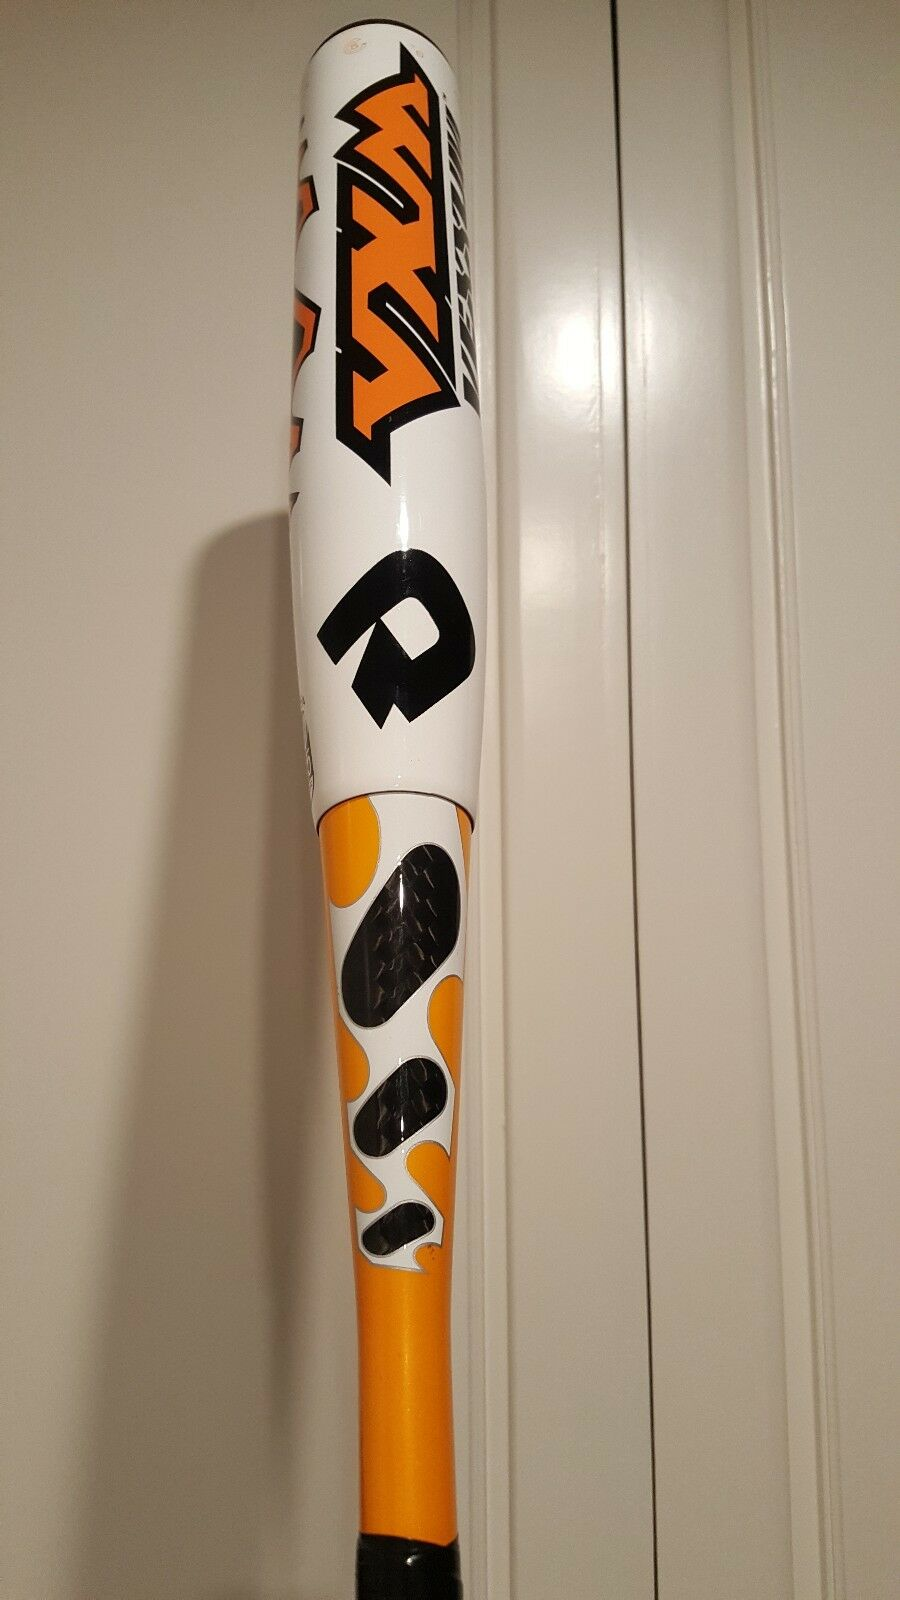 Raro Nuevo 33 28 mod.VX512 -5 Demarini Vexxum bate de béisbol grandes éxitos bombas de barril